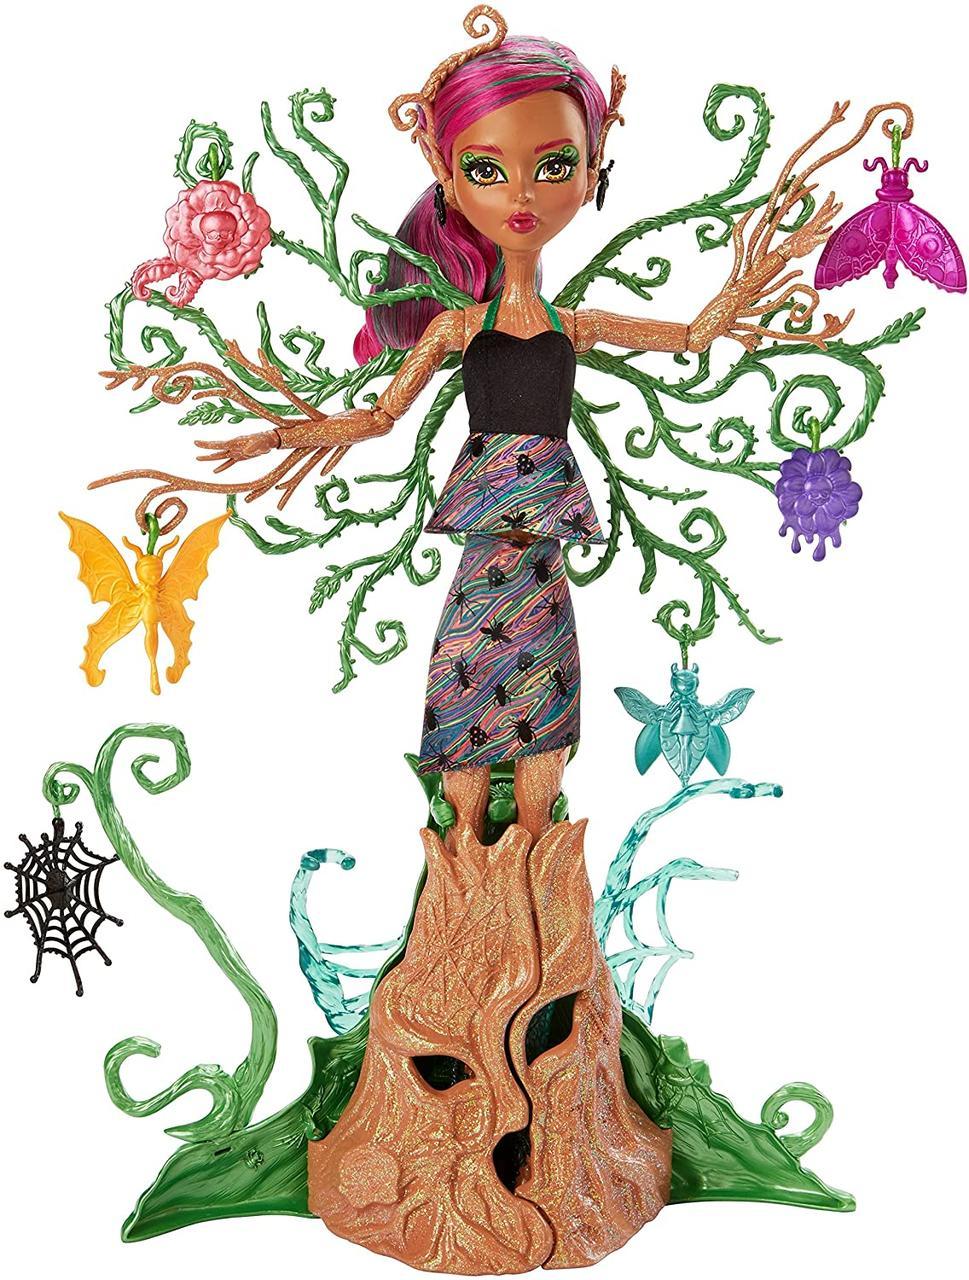 Кукла Монстер Хай Триза Торнвиллоу Садовые монстры Monster High Garden Ghouls Treesa